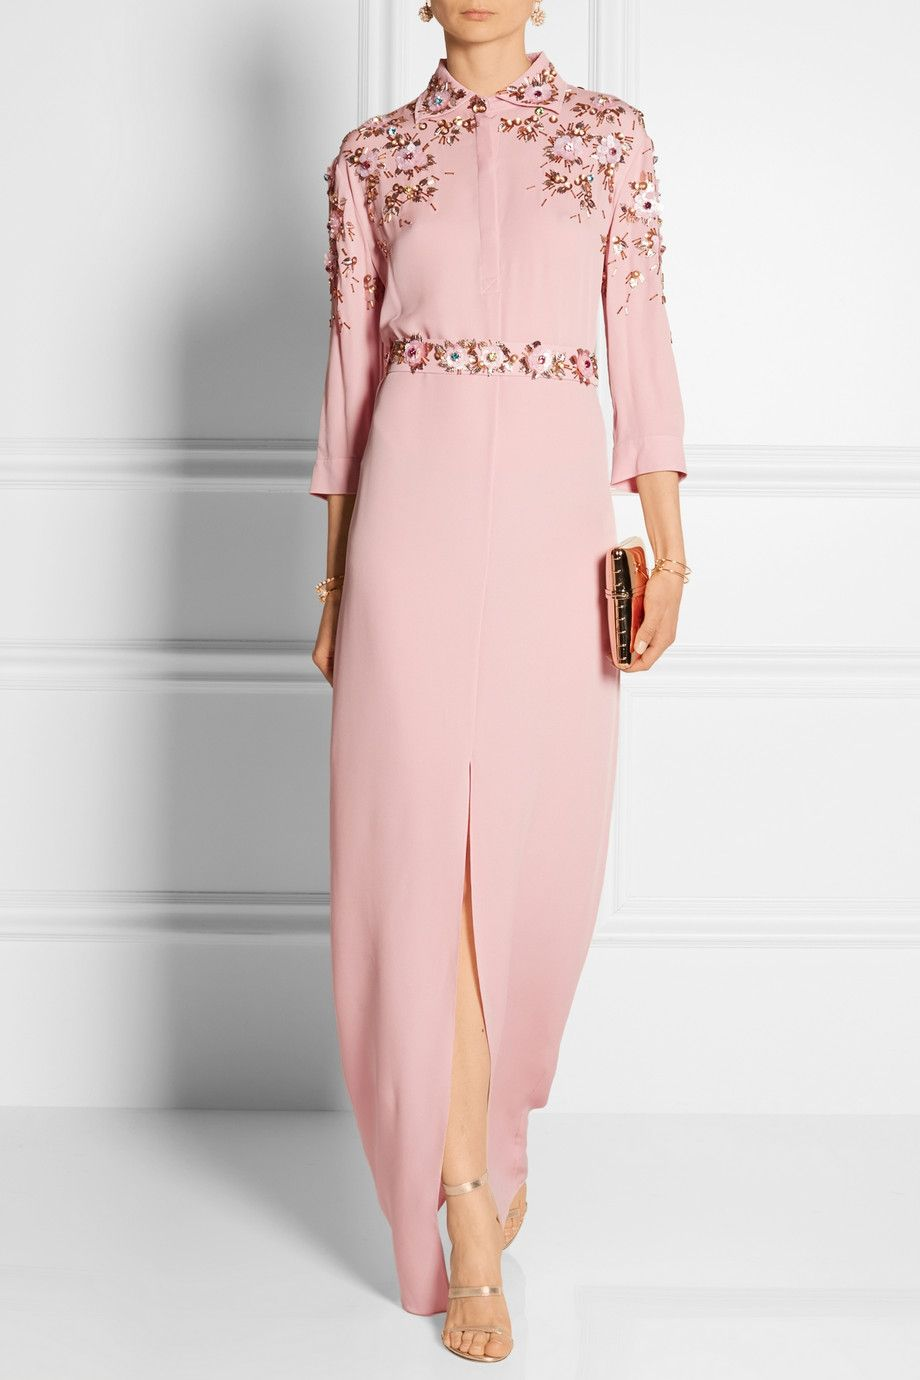 Jenny Packham outfit | Looks | Pinterest